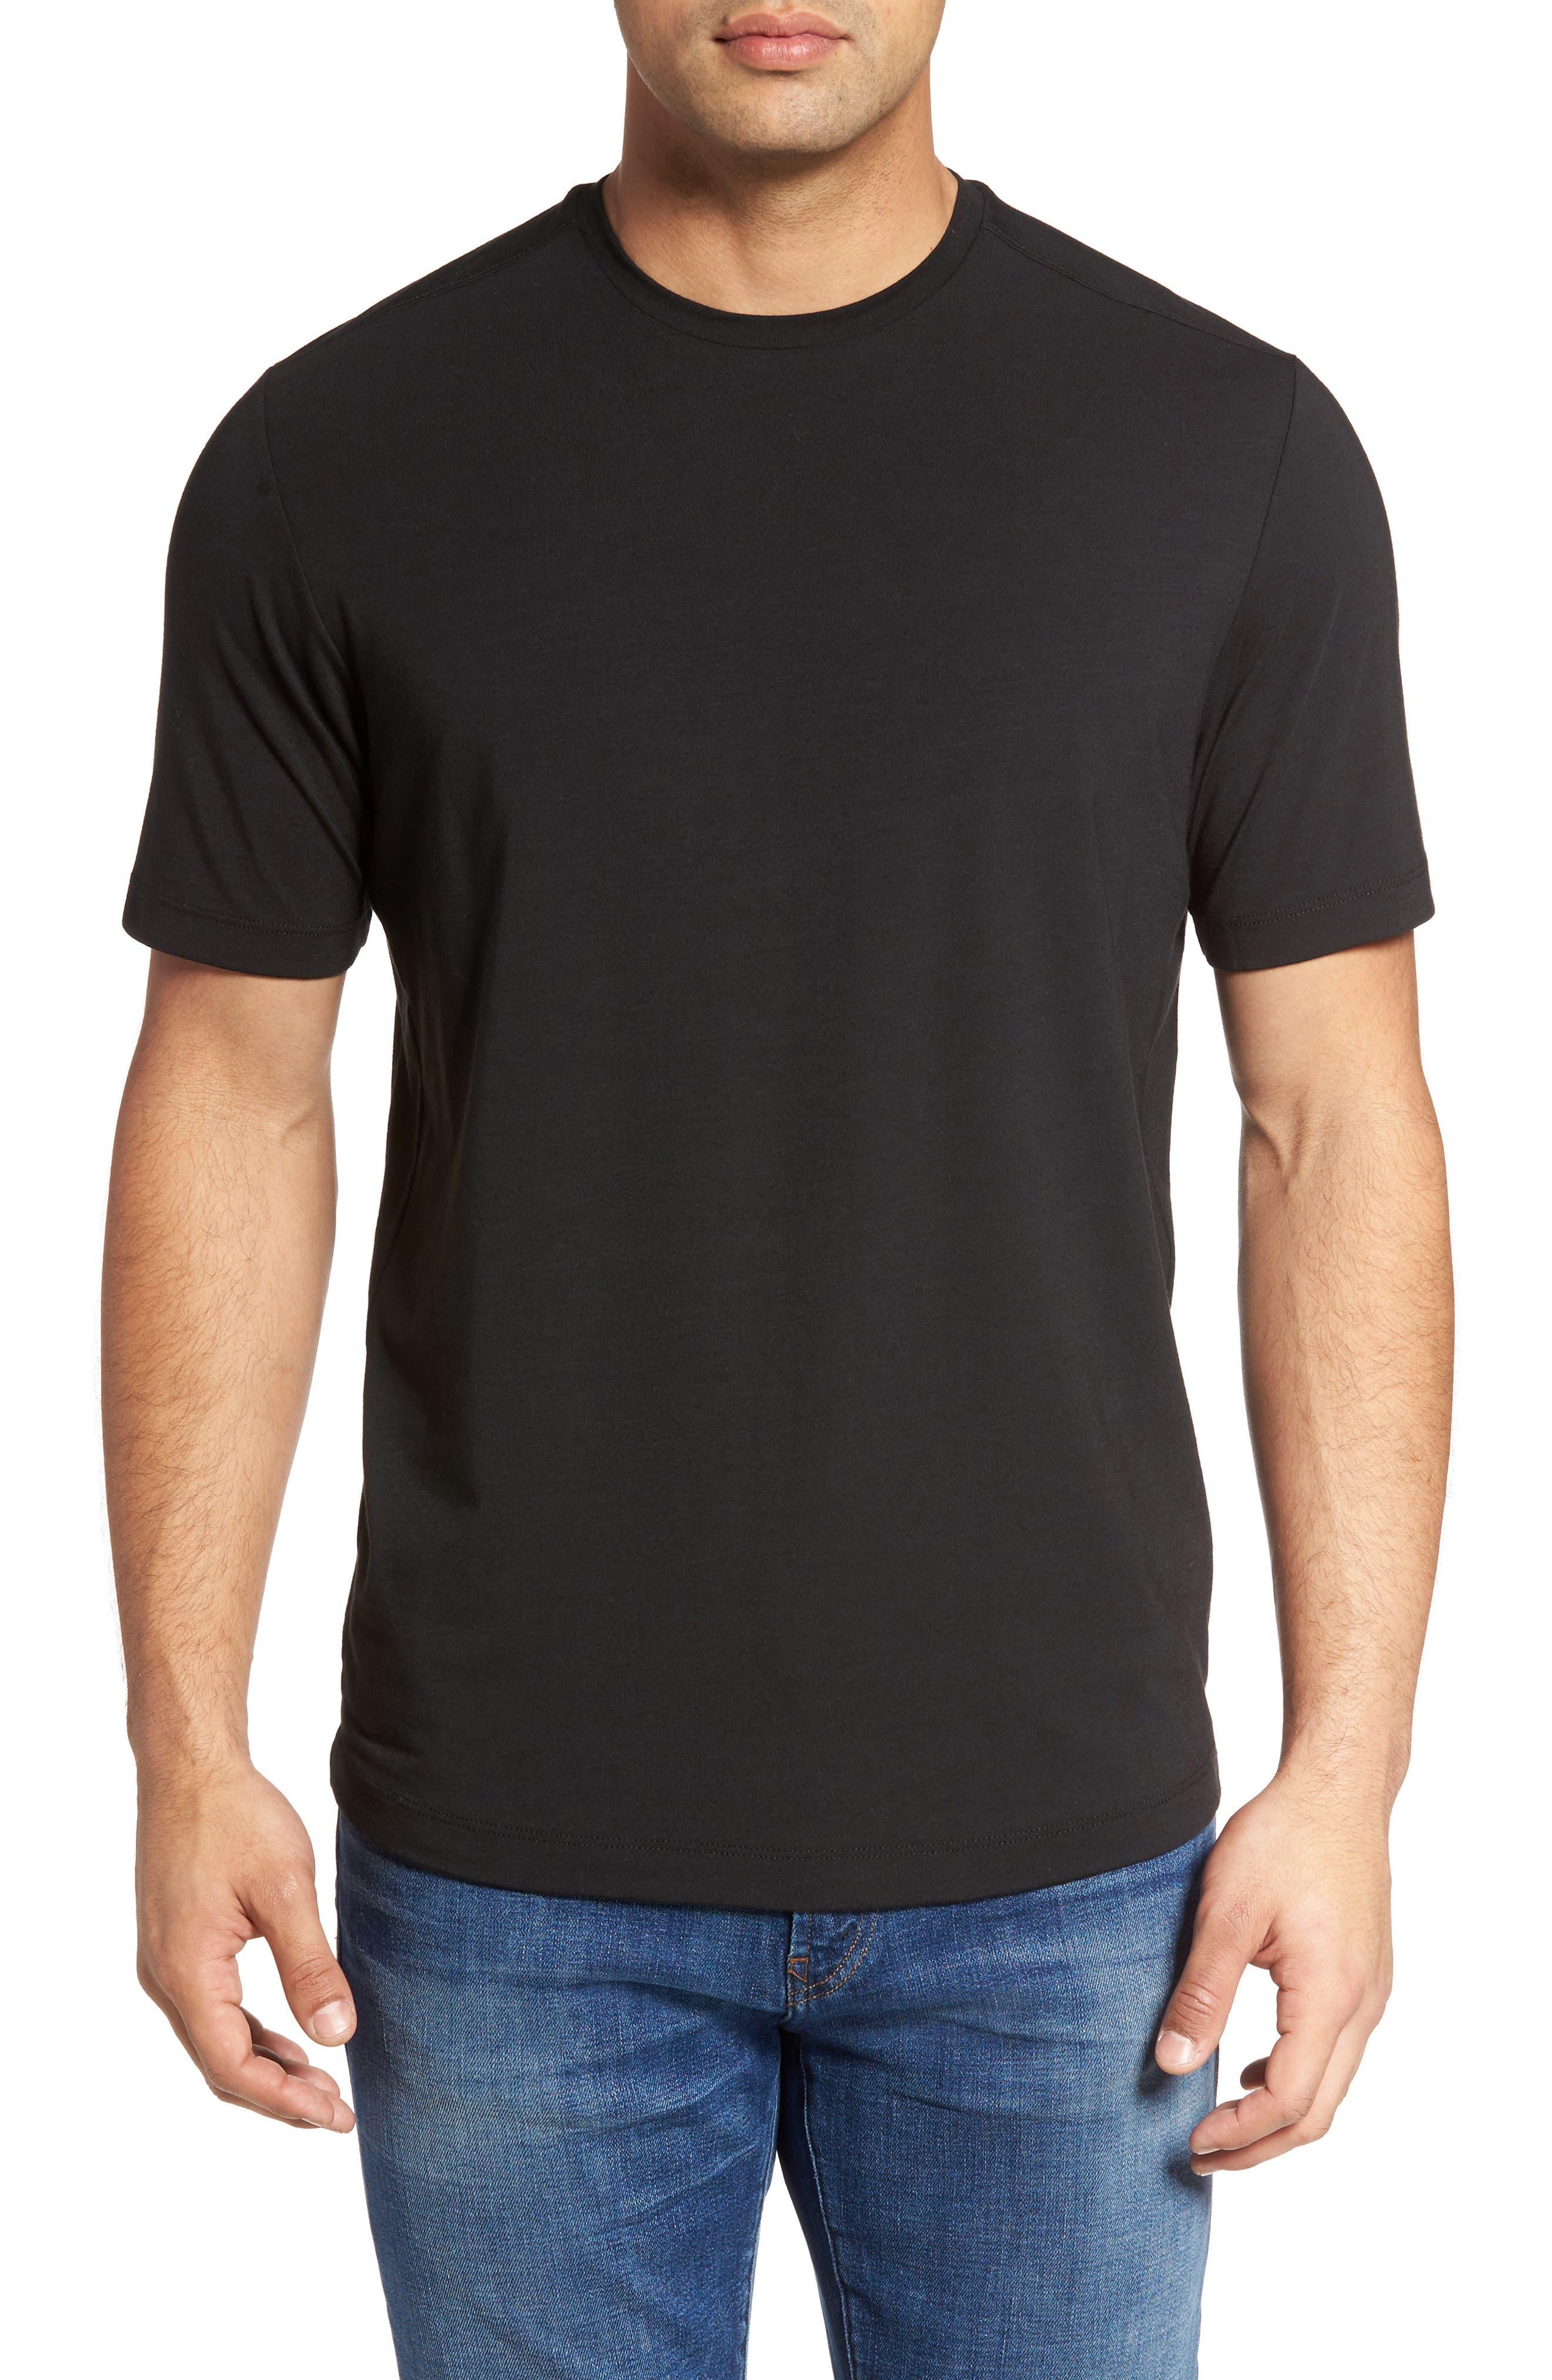 Tropicool T-Shirt,                             Main thumbnail 5, color,